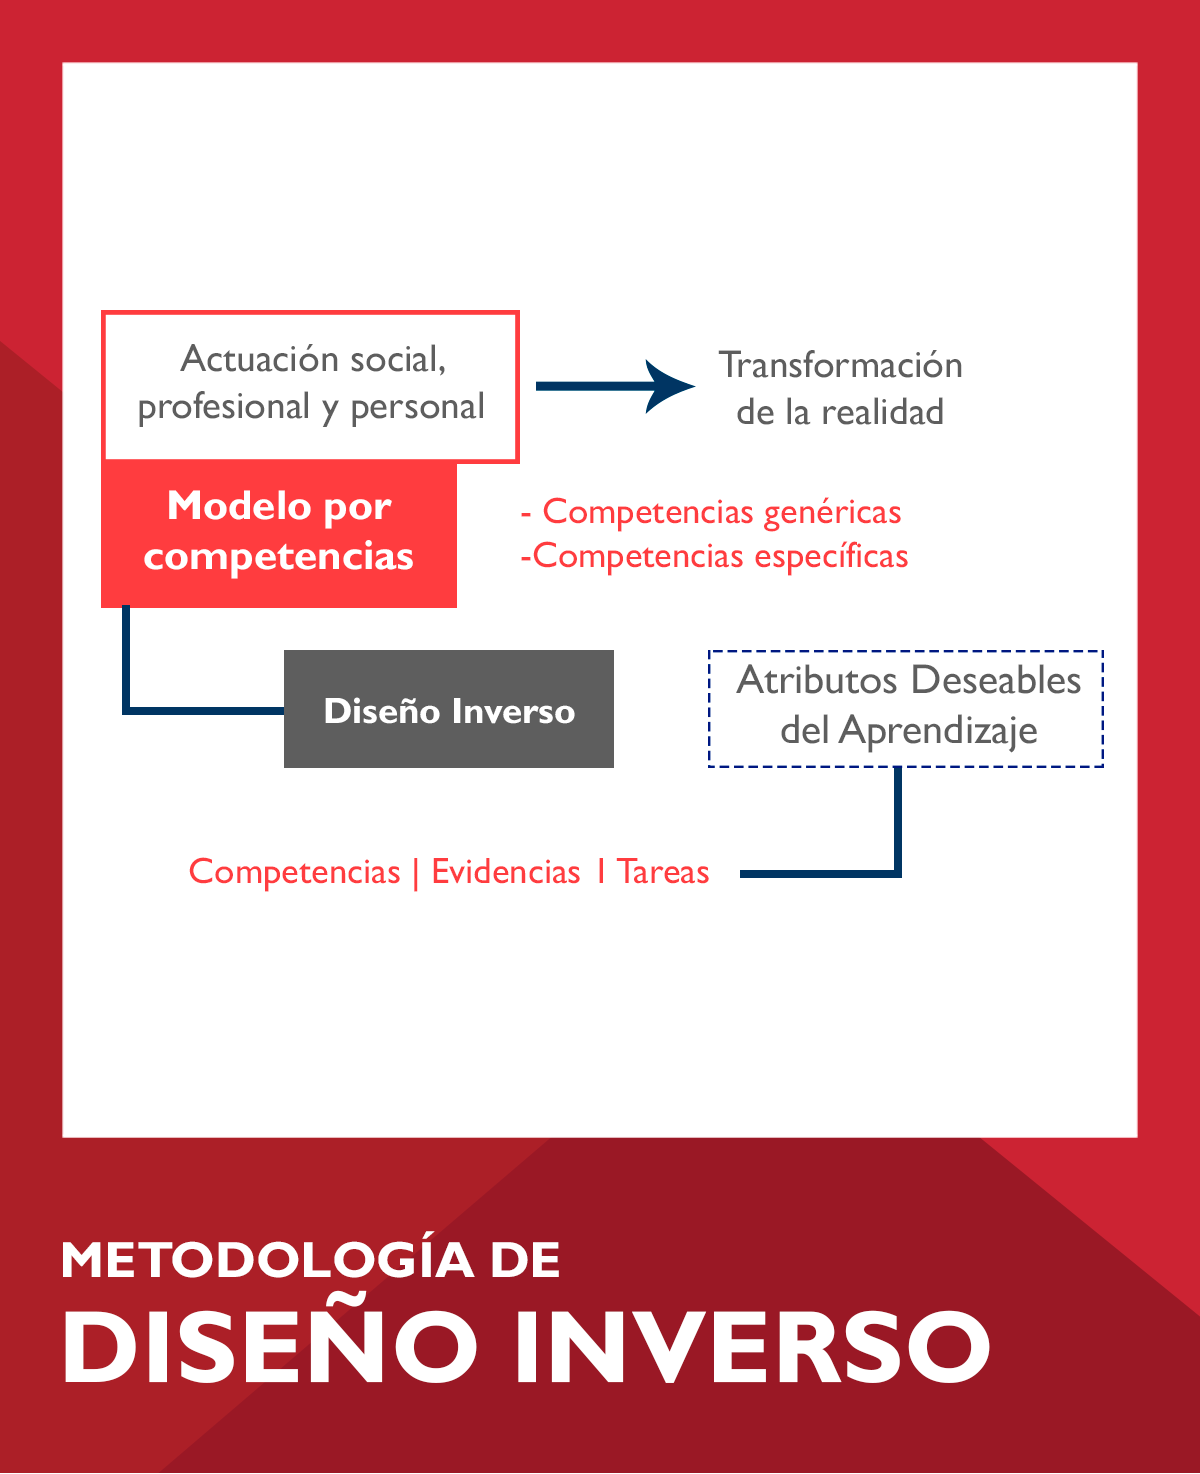 Metodologia de diseño inverso - Modelo educativo IBERO León Virtual